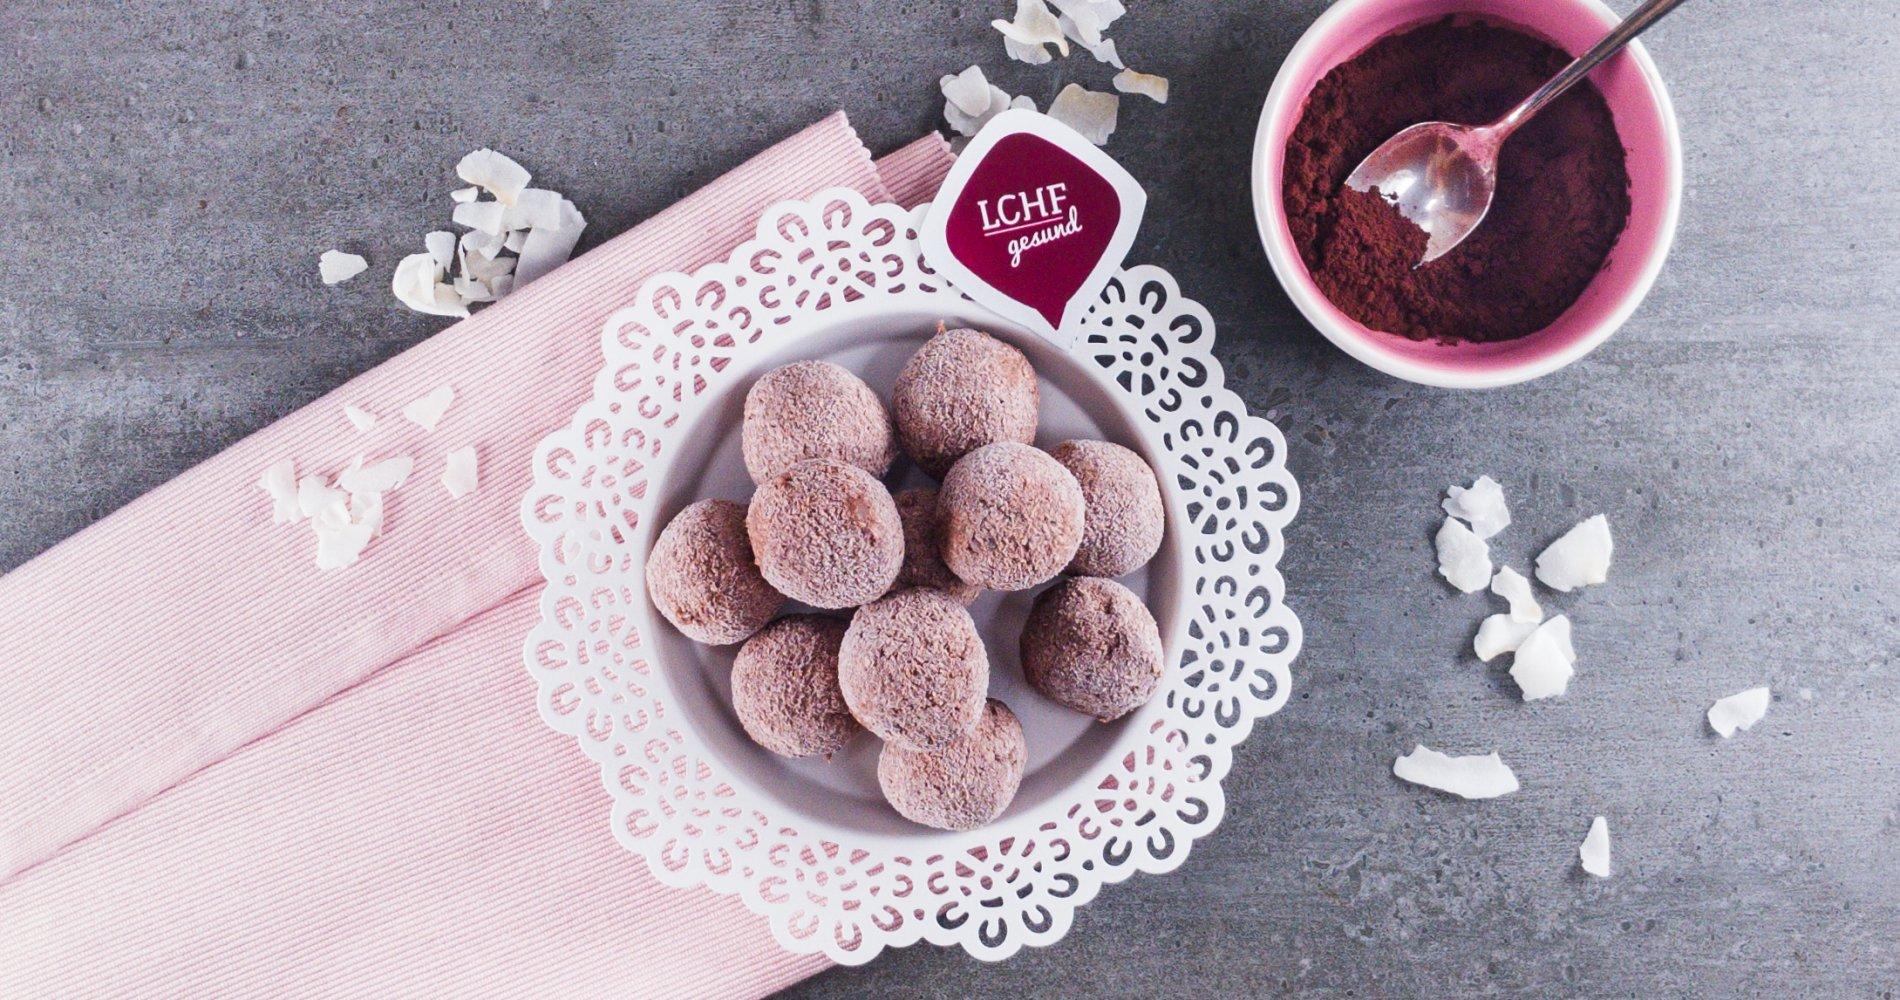 Rezept Low Carb: Eispralinen mit Kokos - LCHF-gesund.de